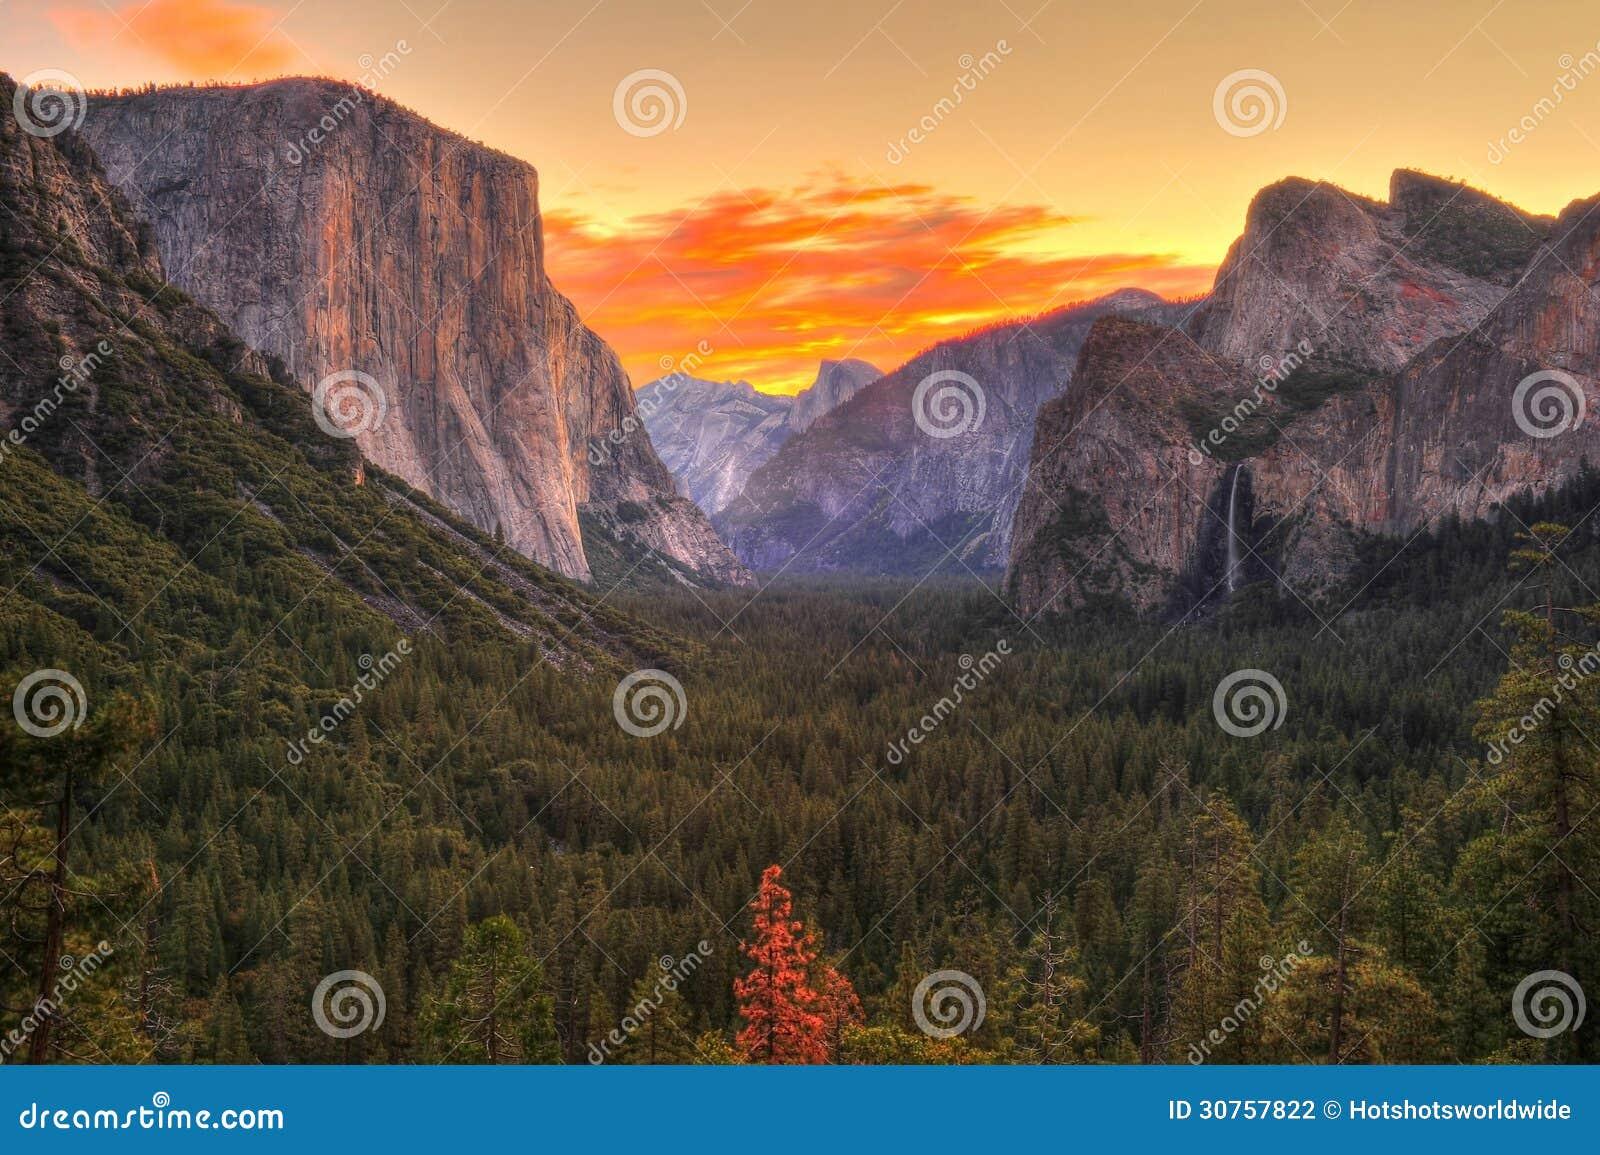 Hisnande Yosemite nationalpark på soluppgång/gryning, Kalifornien